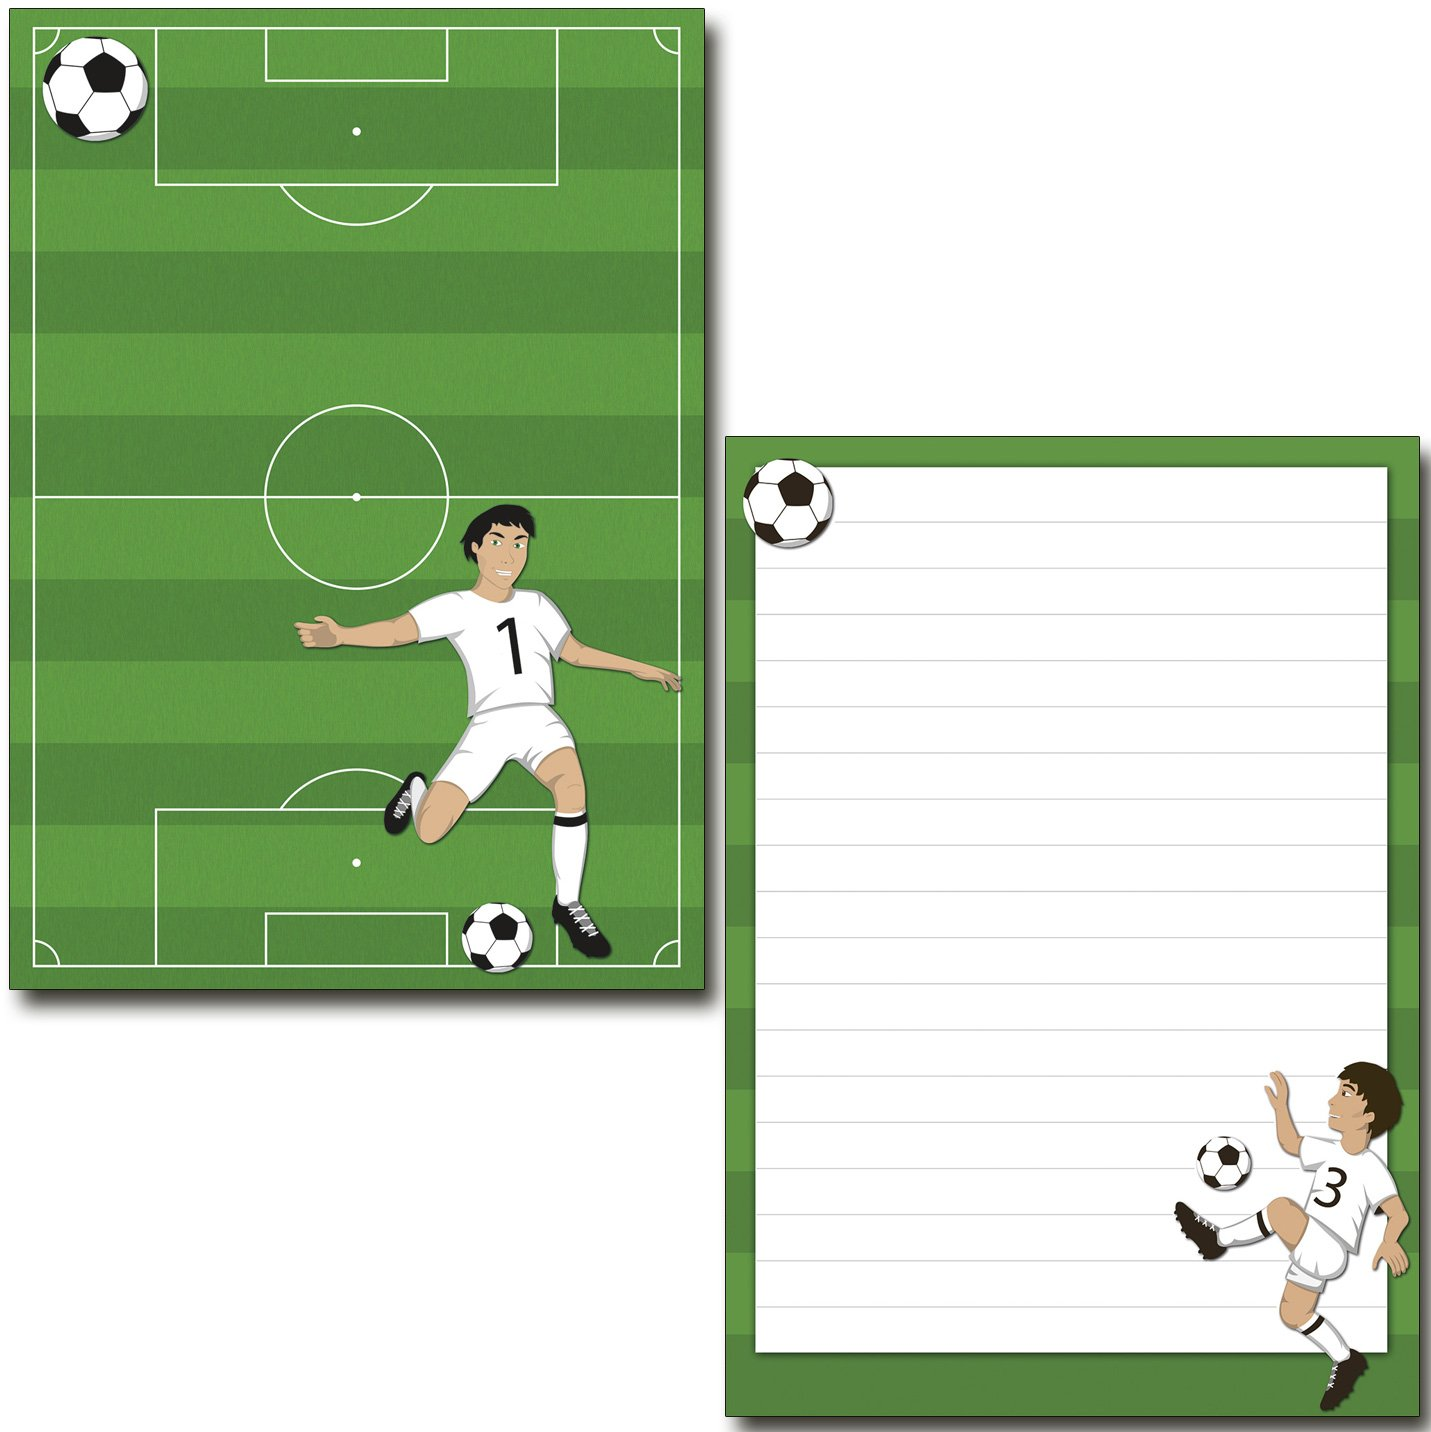 2 Stü ck Schreibblö cke Fuß ball 50 Blatt Format DIN A5 mit Deckblatt 7150 Konzept-G